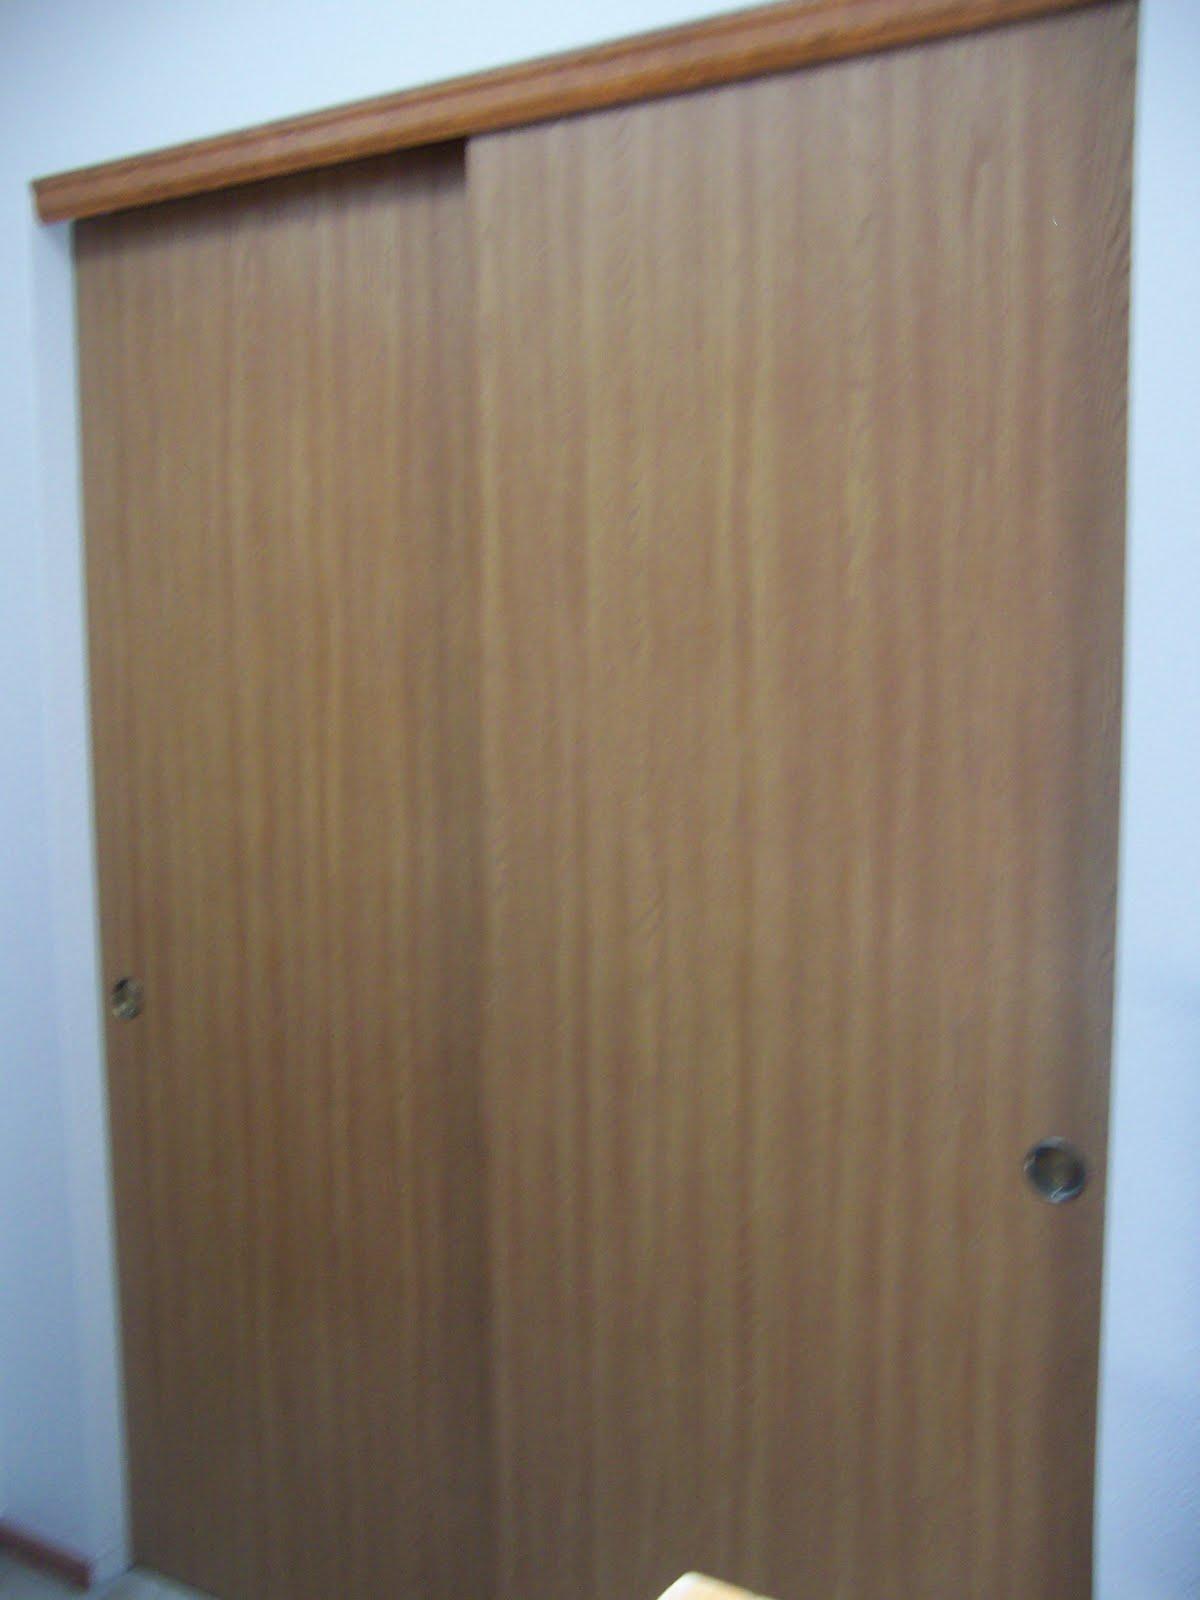 Sliding Closet Doirs Remodelaholic Frugalicious Closet Door Makeover Monthly Contributor